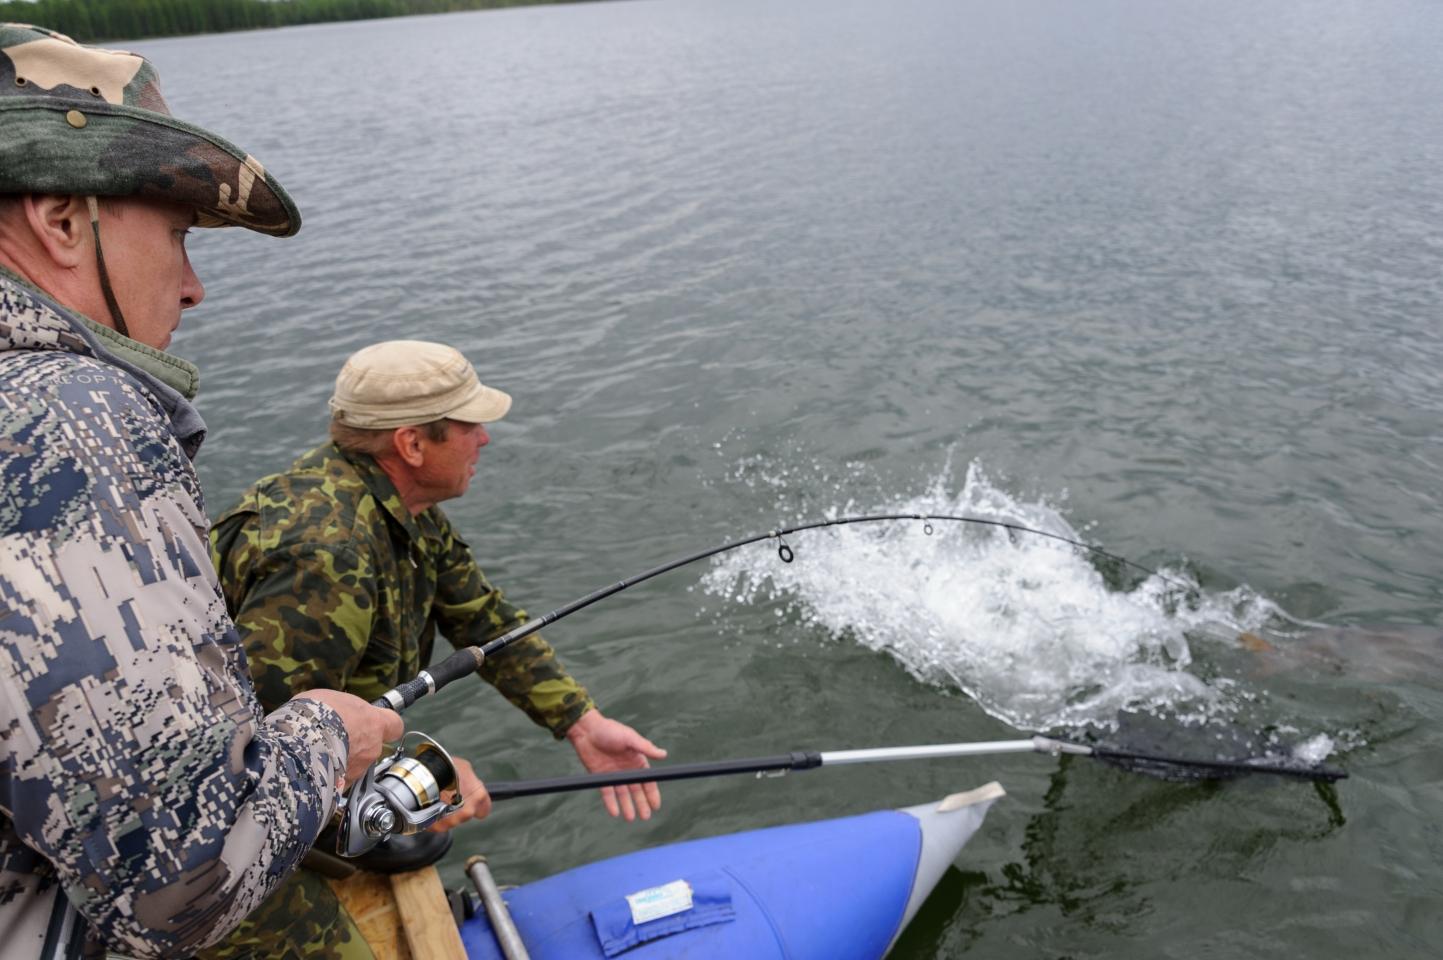 Так поймал Путин щуку или нет? Рыбалка Путина на щуку